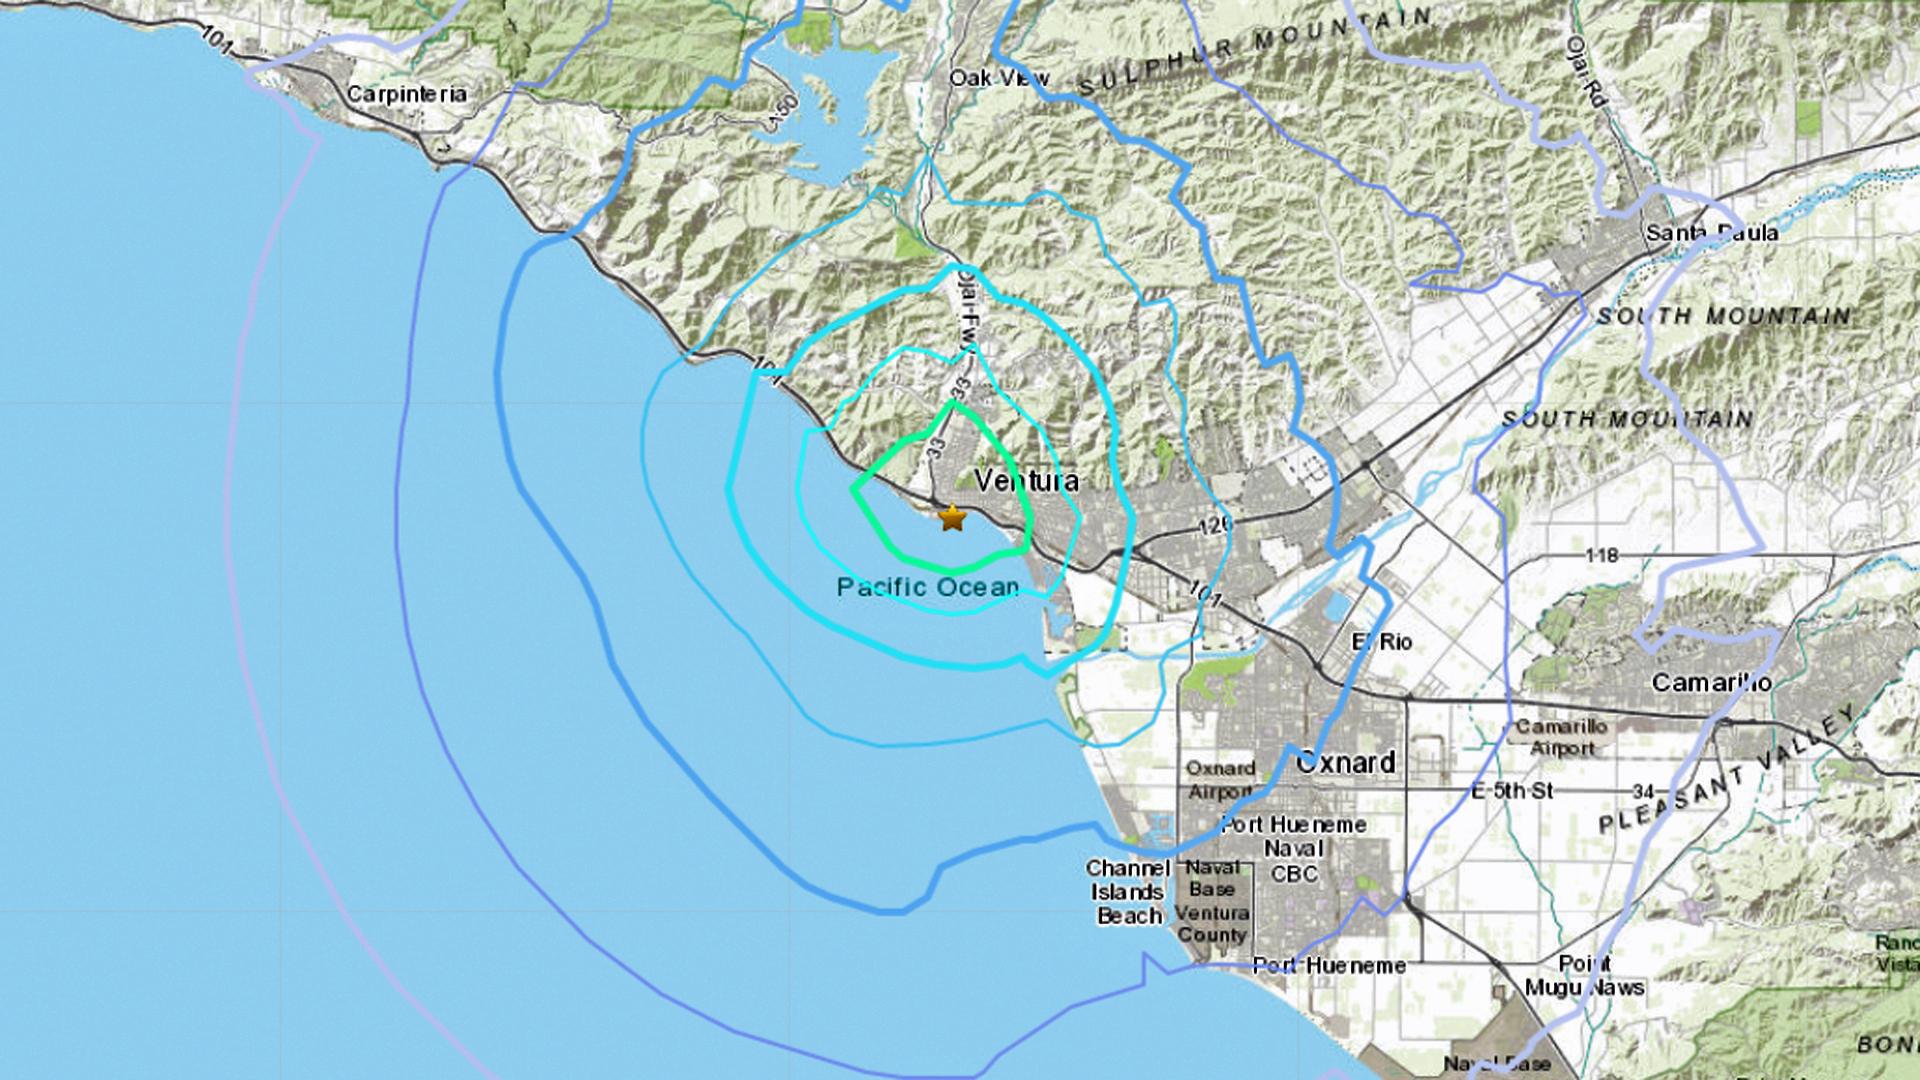 A 3.6 magnitude earthquake struck near Ventura on Nov. 8, 2019. (Credit: USGS)